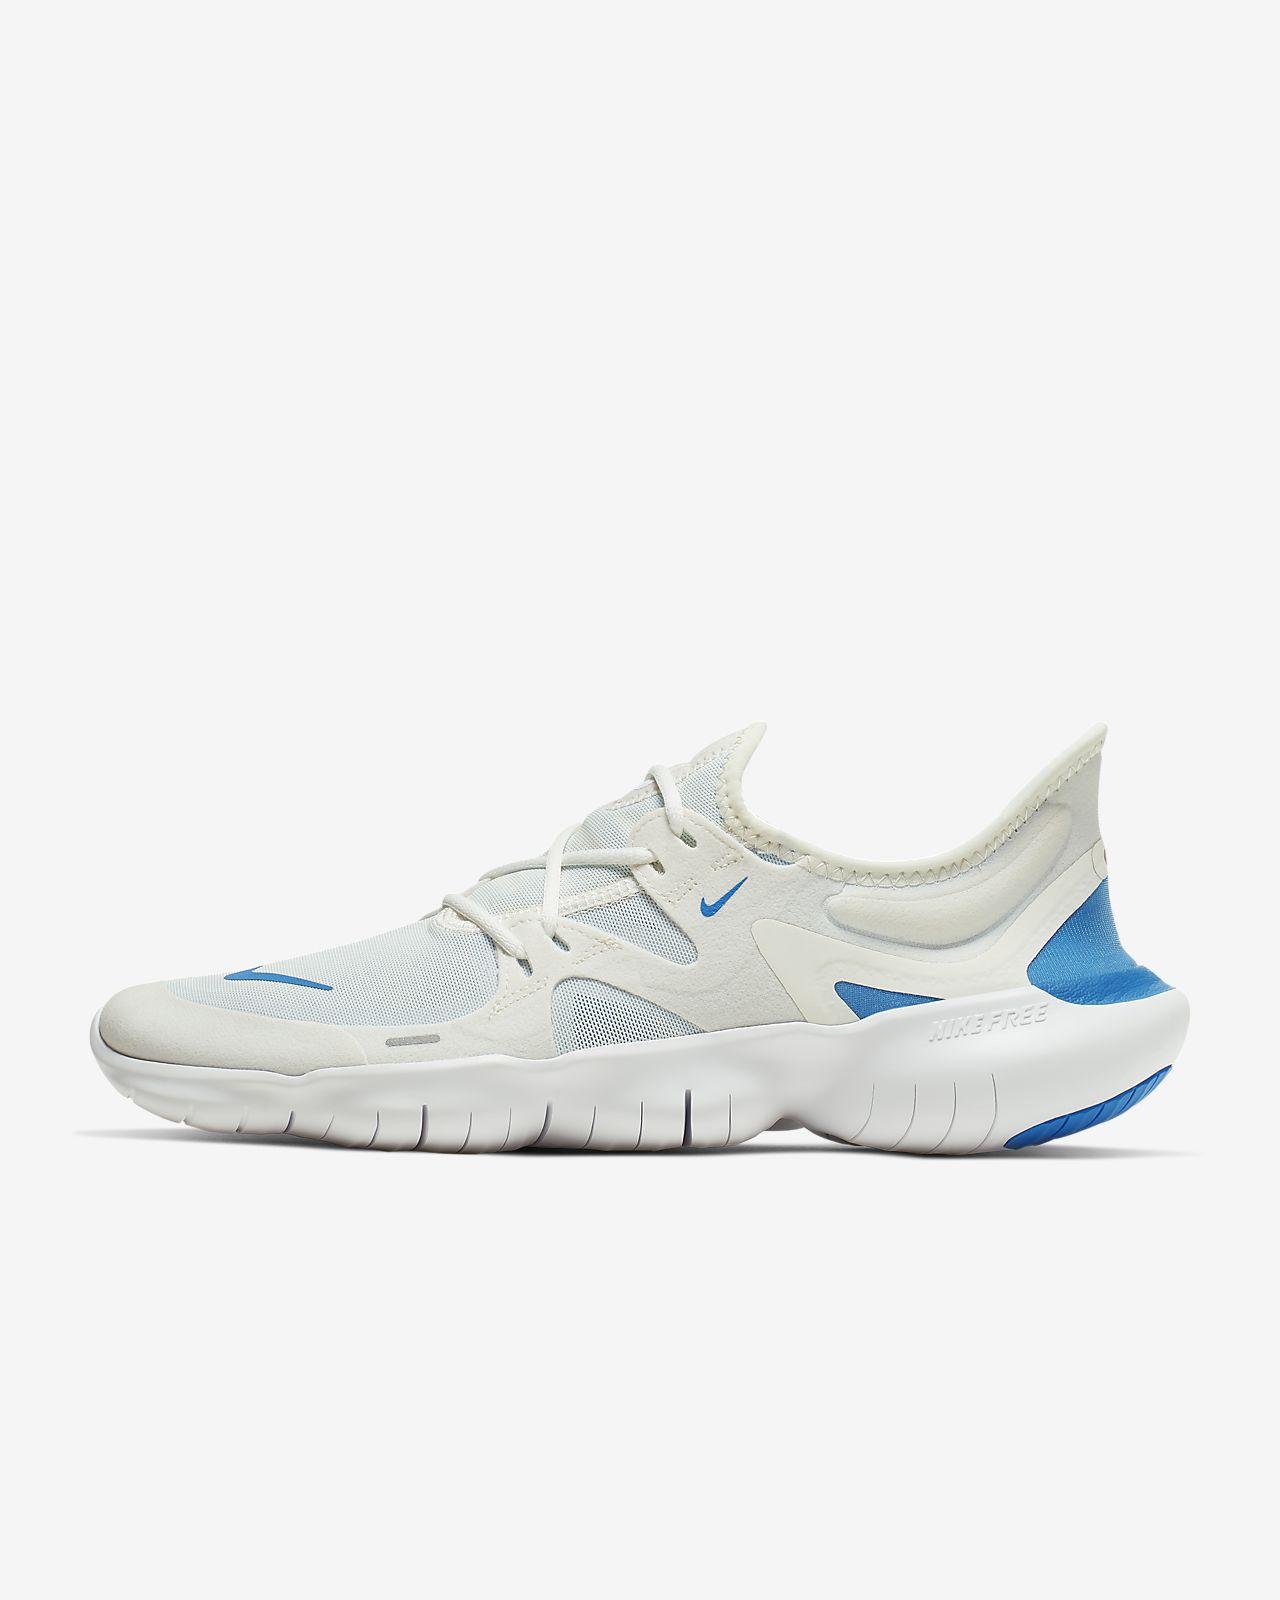 Calzado de running para hombre Nike Free RN 5.0